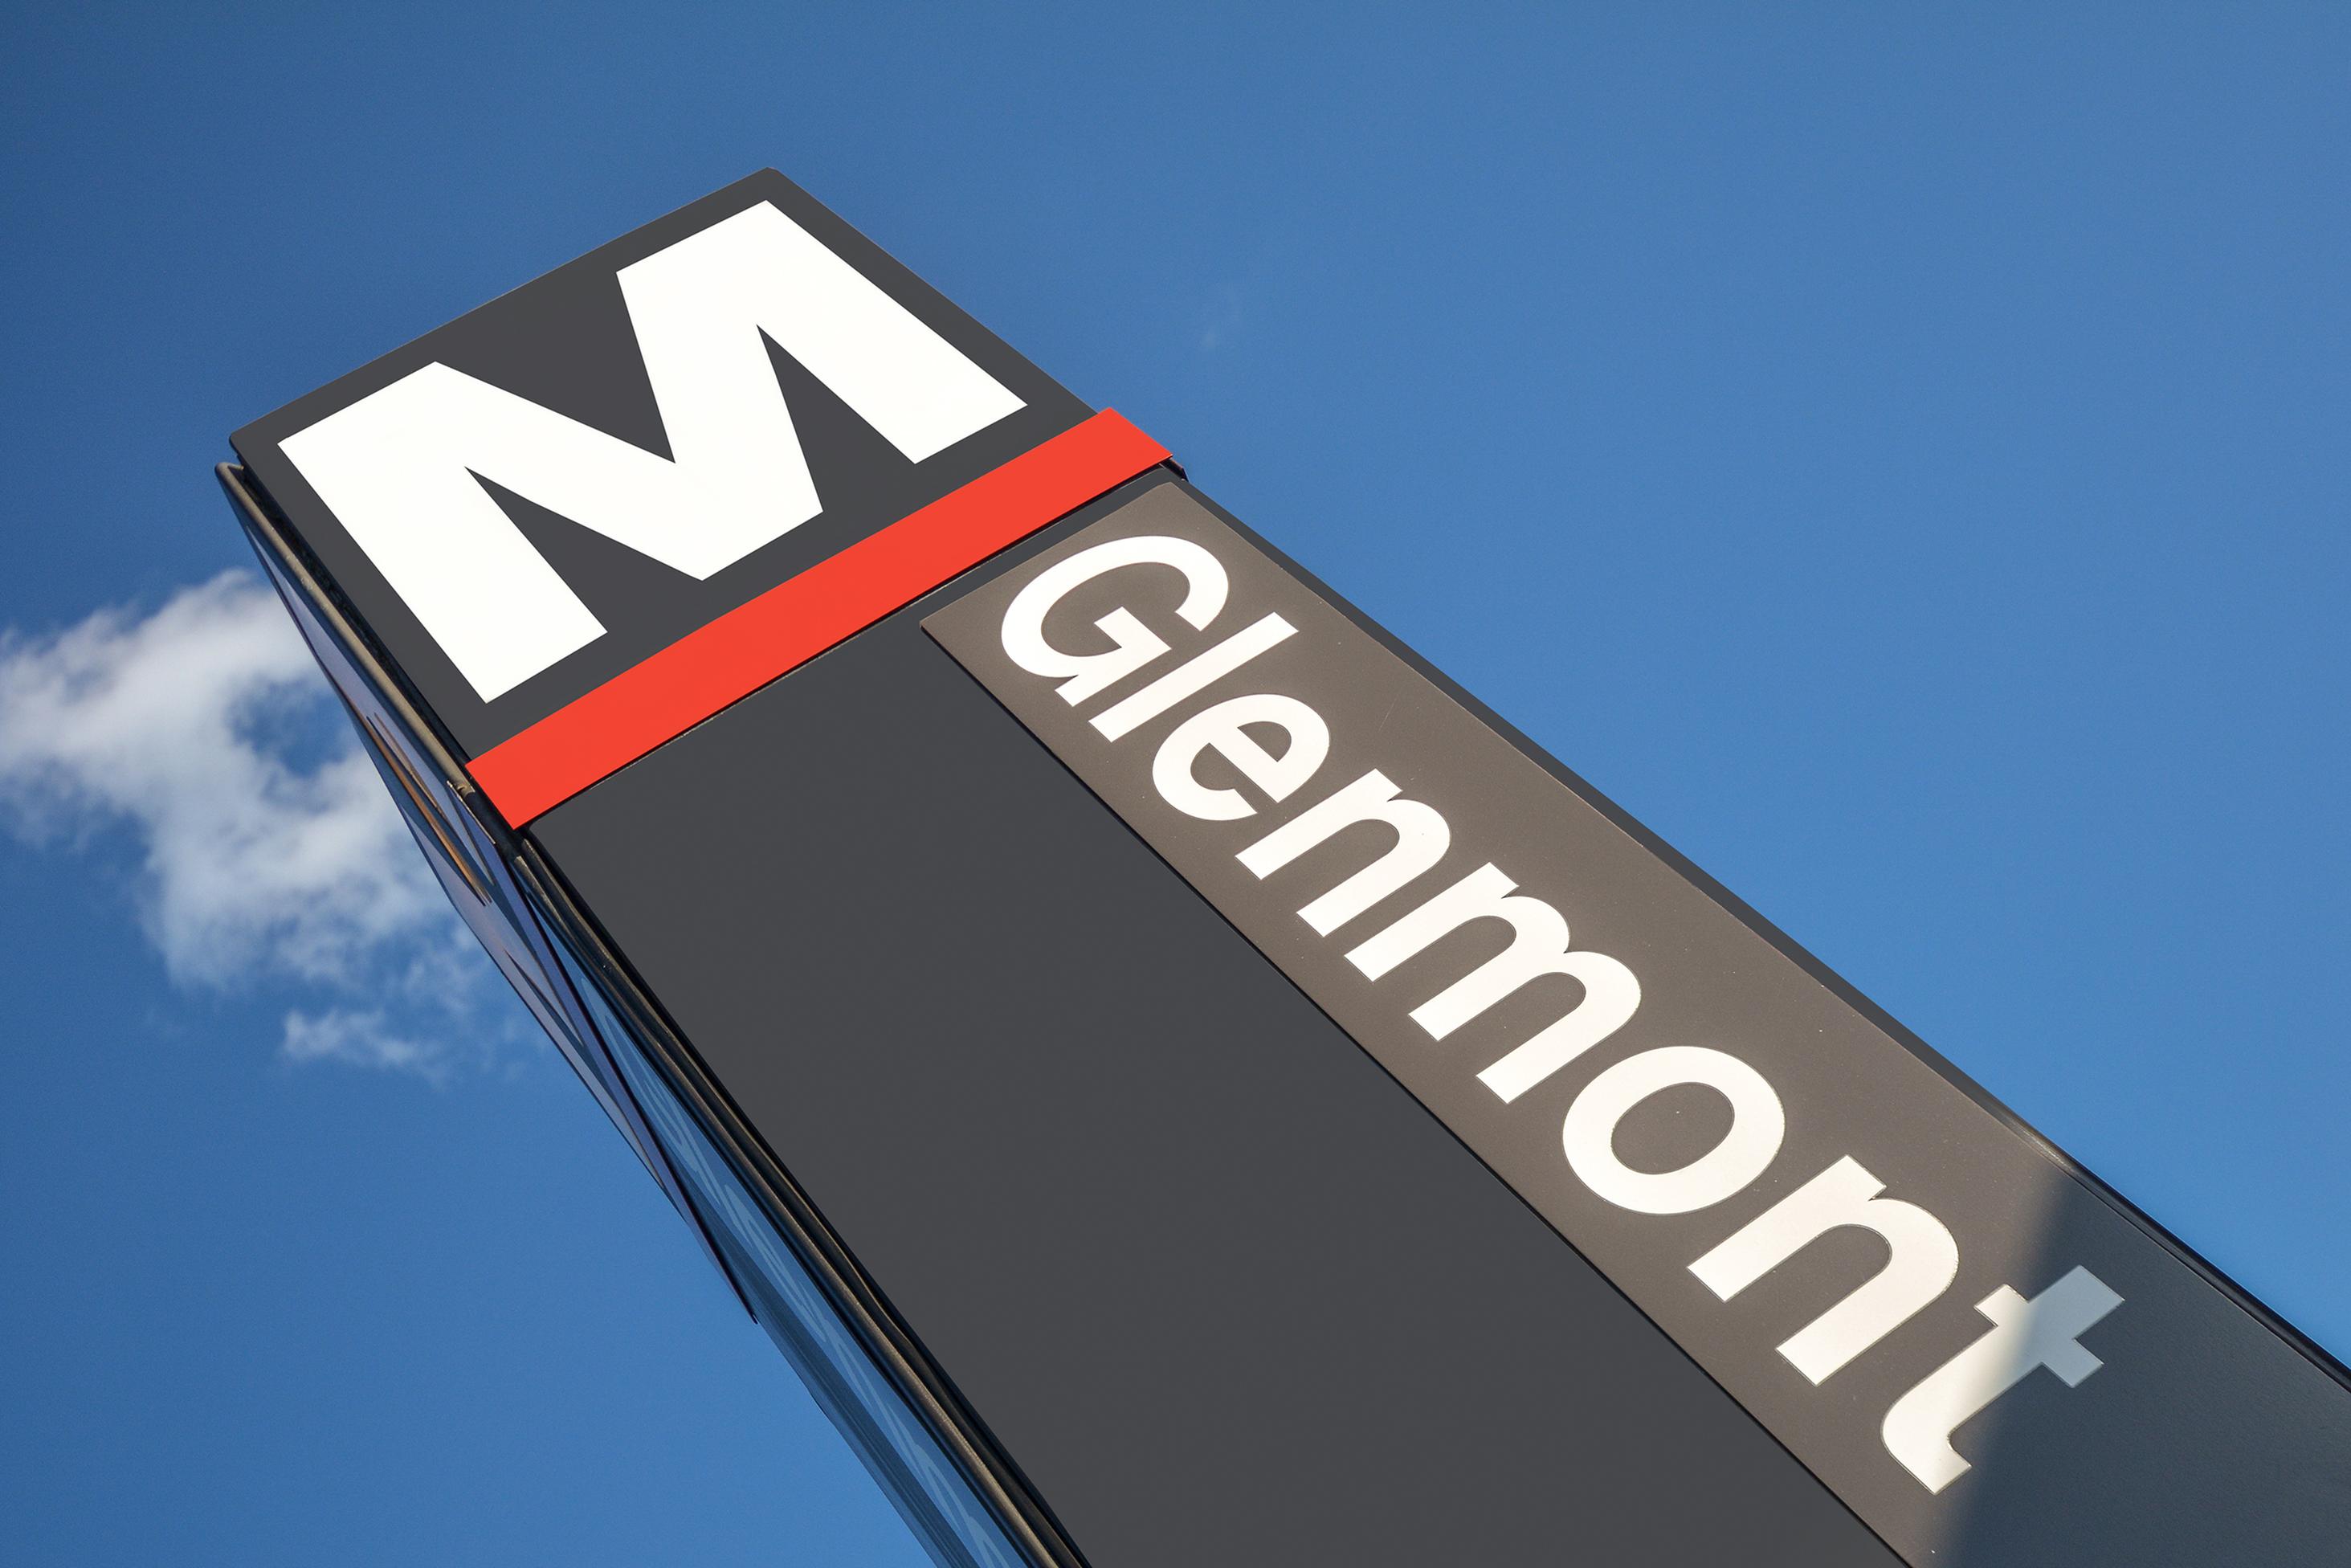 Glenmont Metro   Luxury Apartments Silver Spring MD   Apartments Glenmont MD   Landmark Glenmont Station